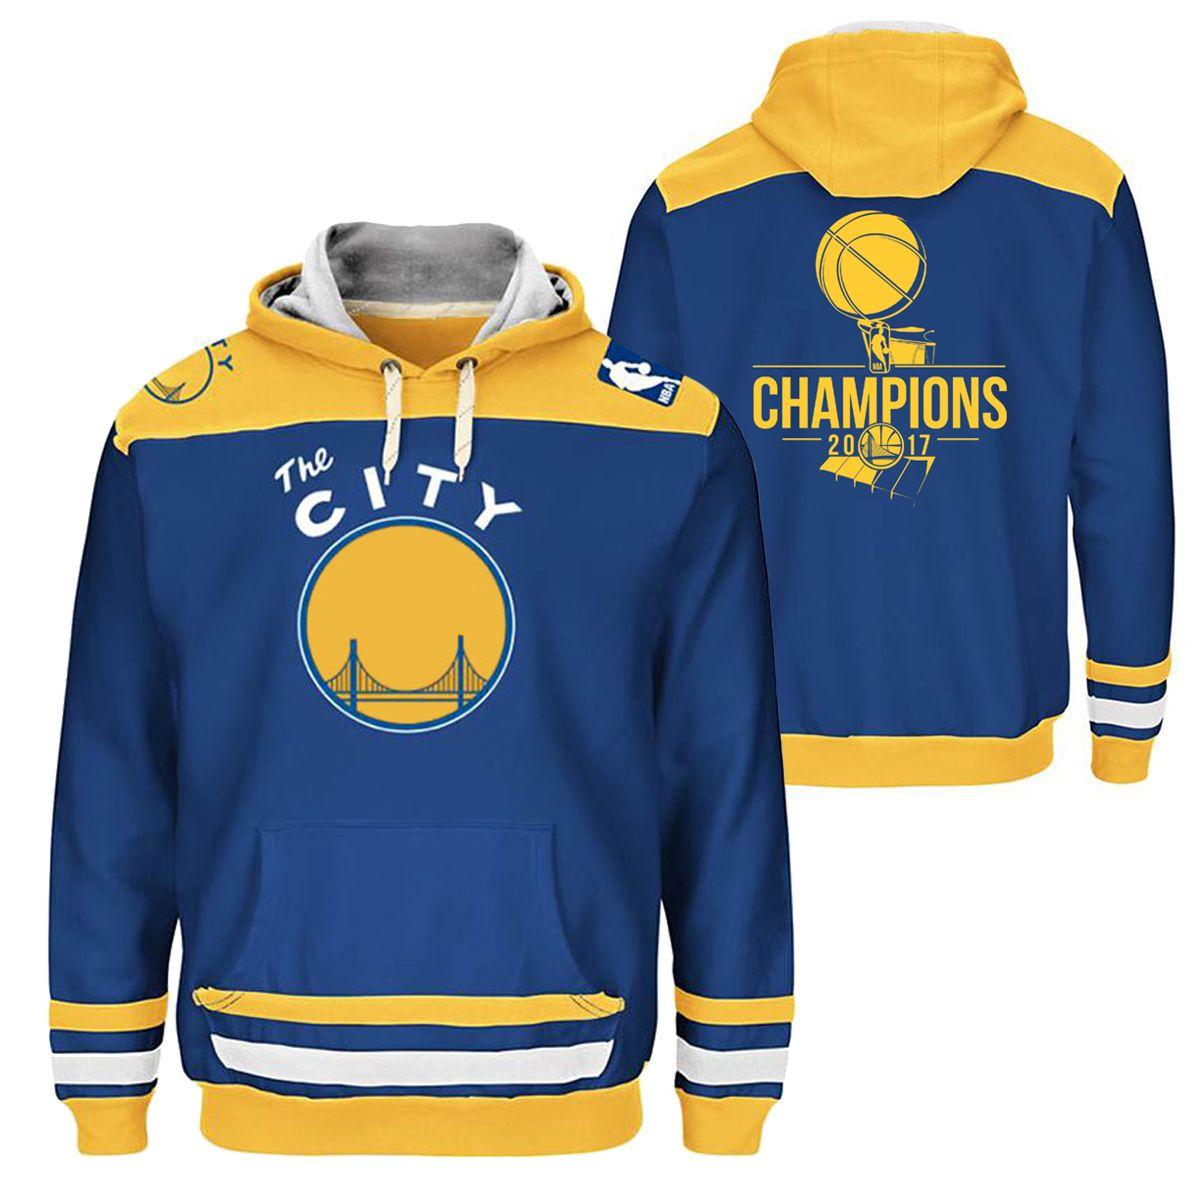 huge discount 7ba6f 3f4f0 warriors championship hoodie